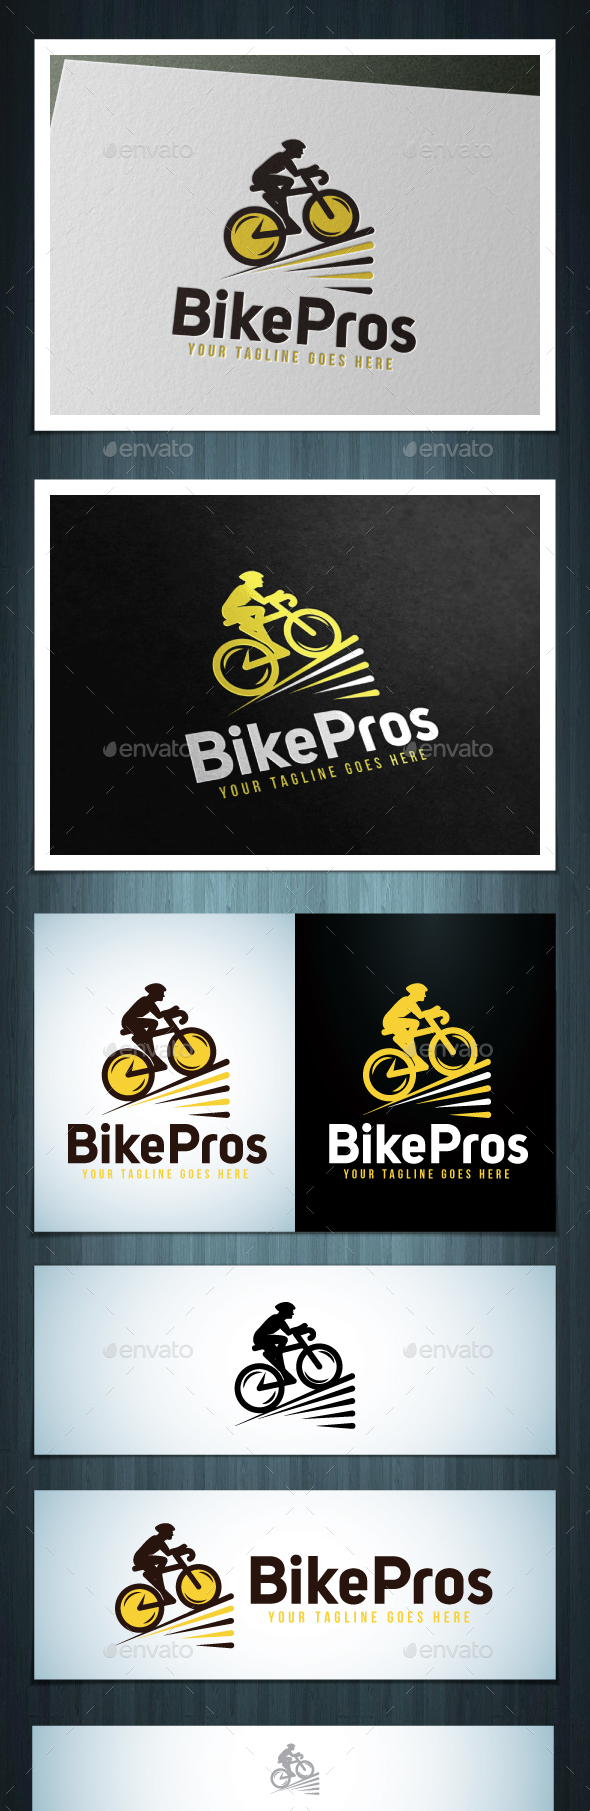 Bike Pros